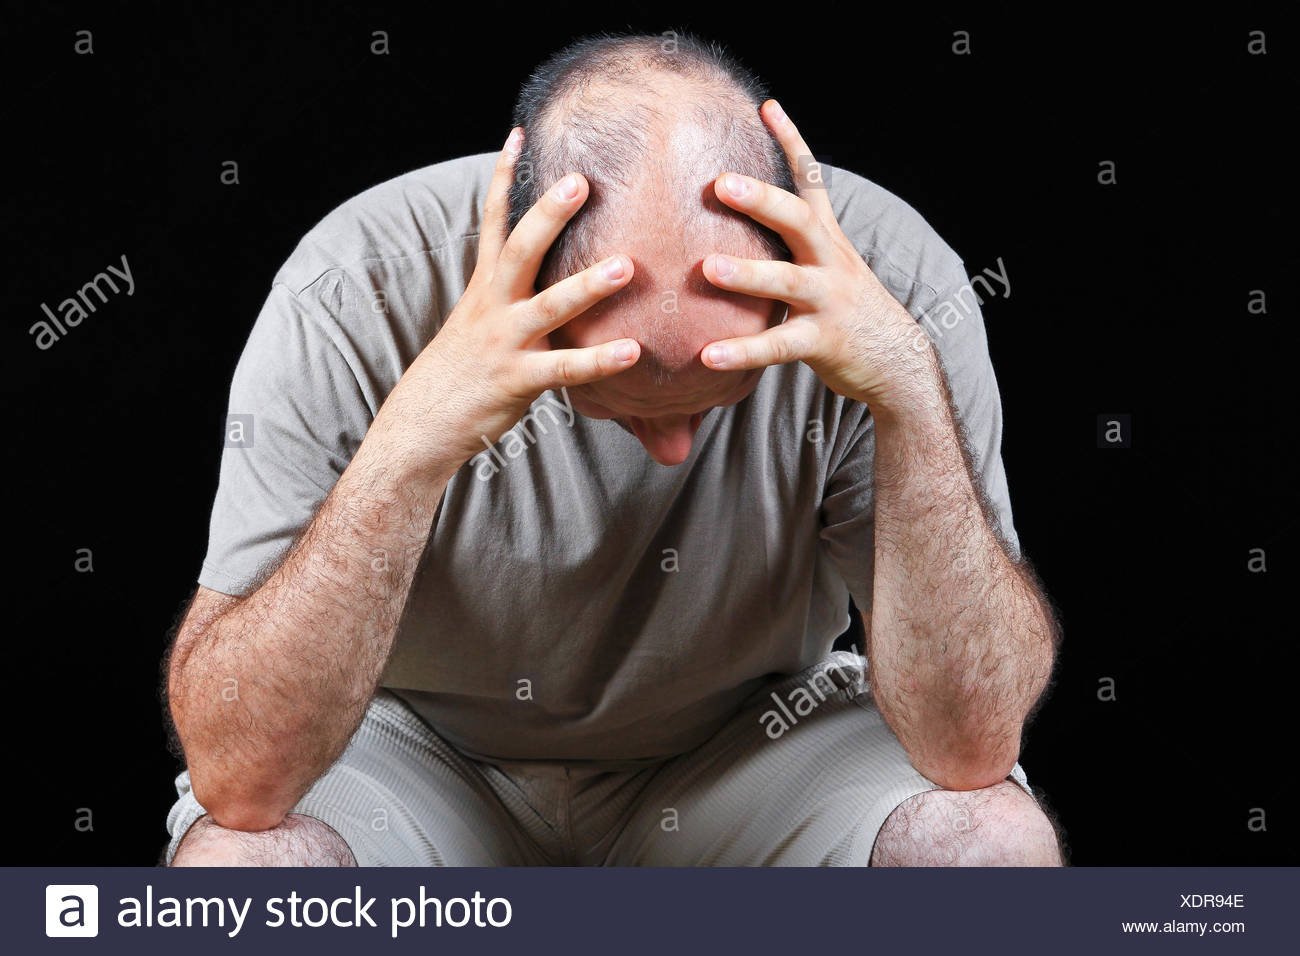 Worried man - Stock Image